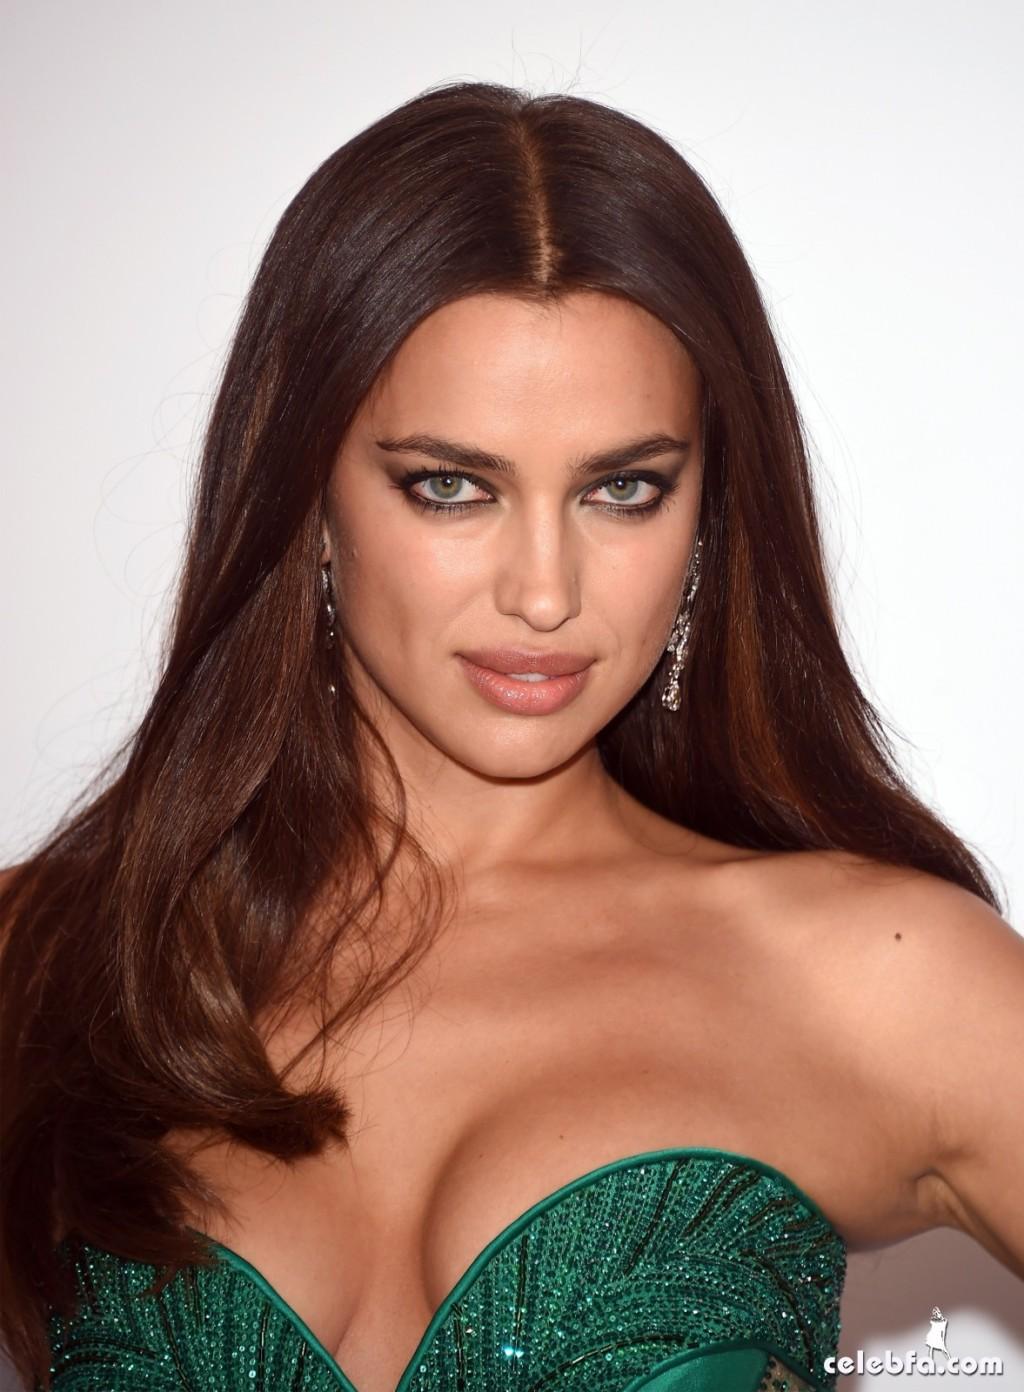 Irina_Shayk_amfAR's Cannes Gala (3)